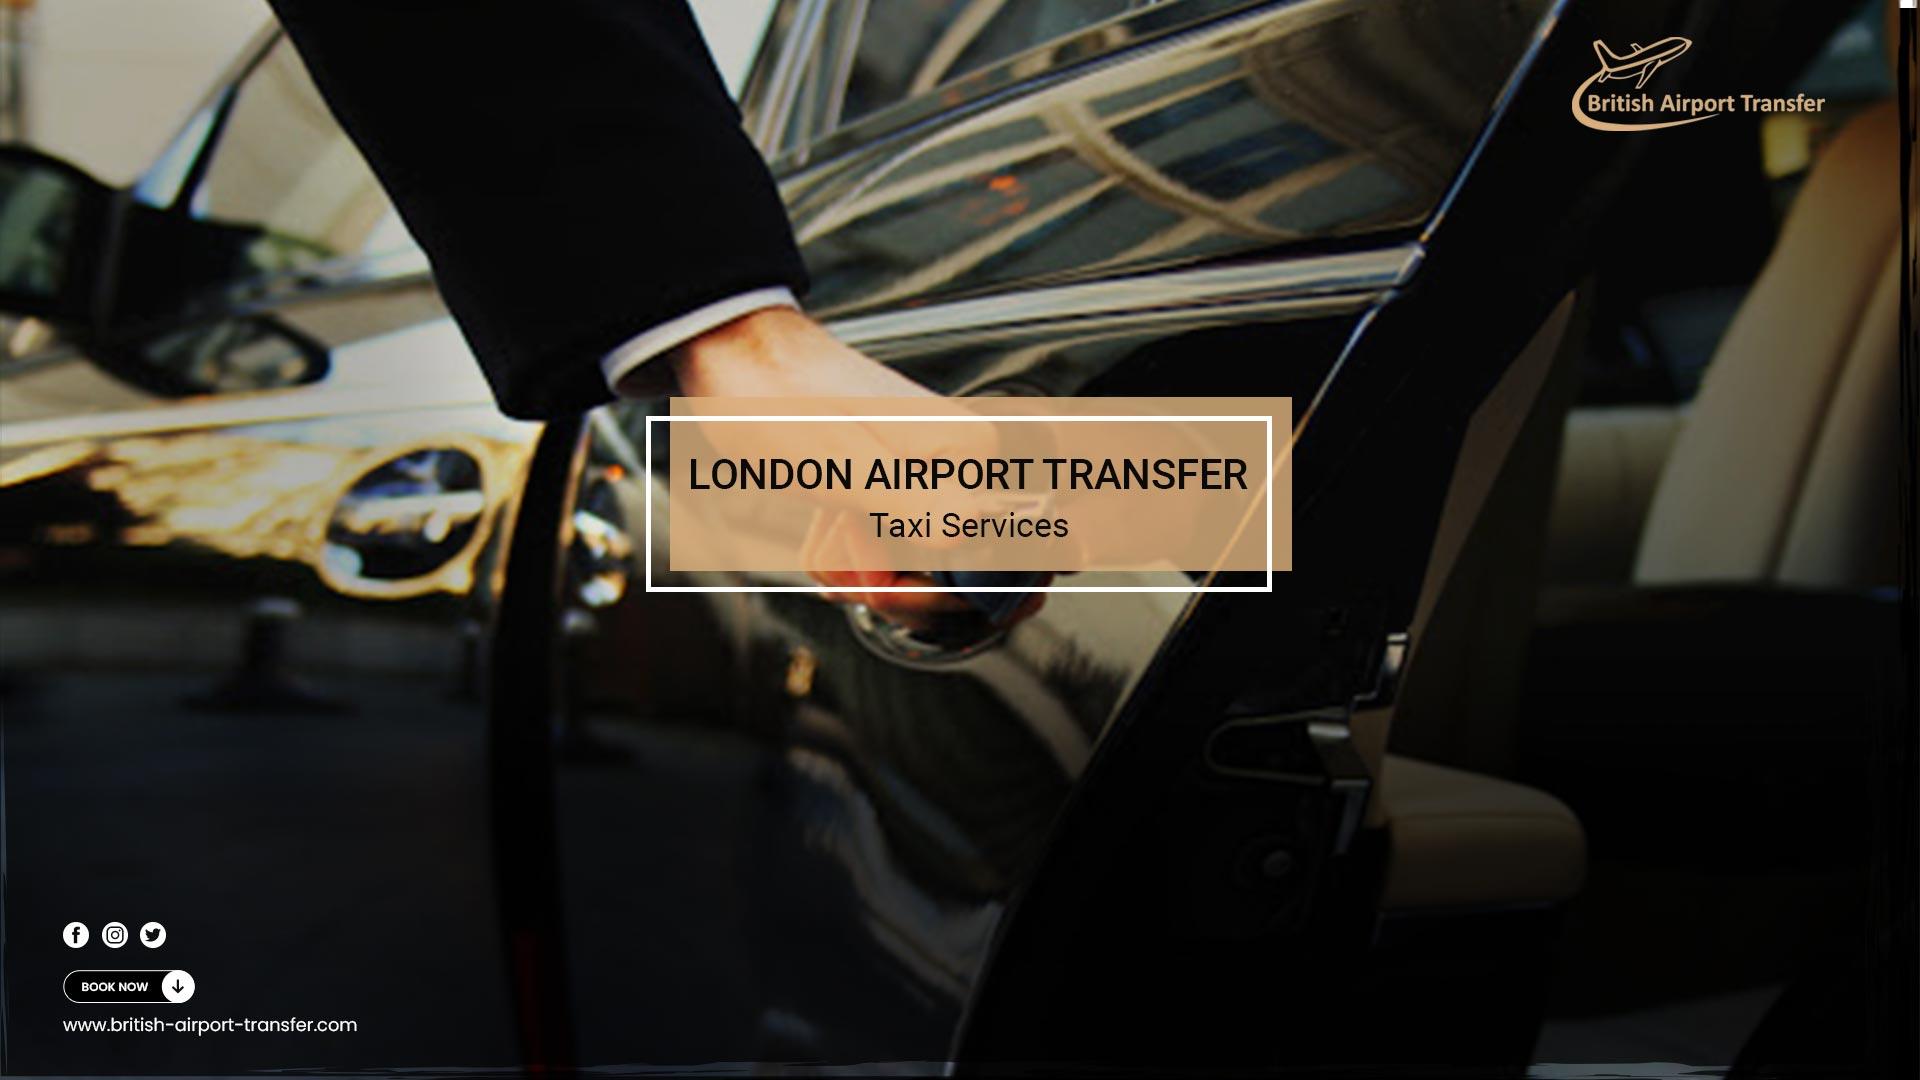 London Airport Transfers